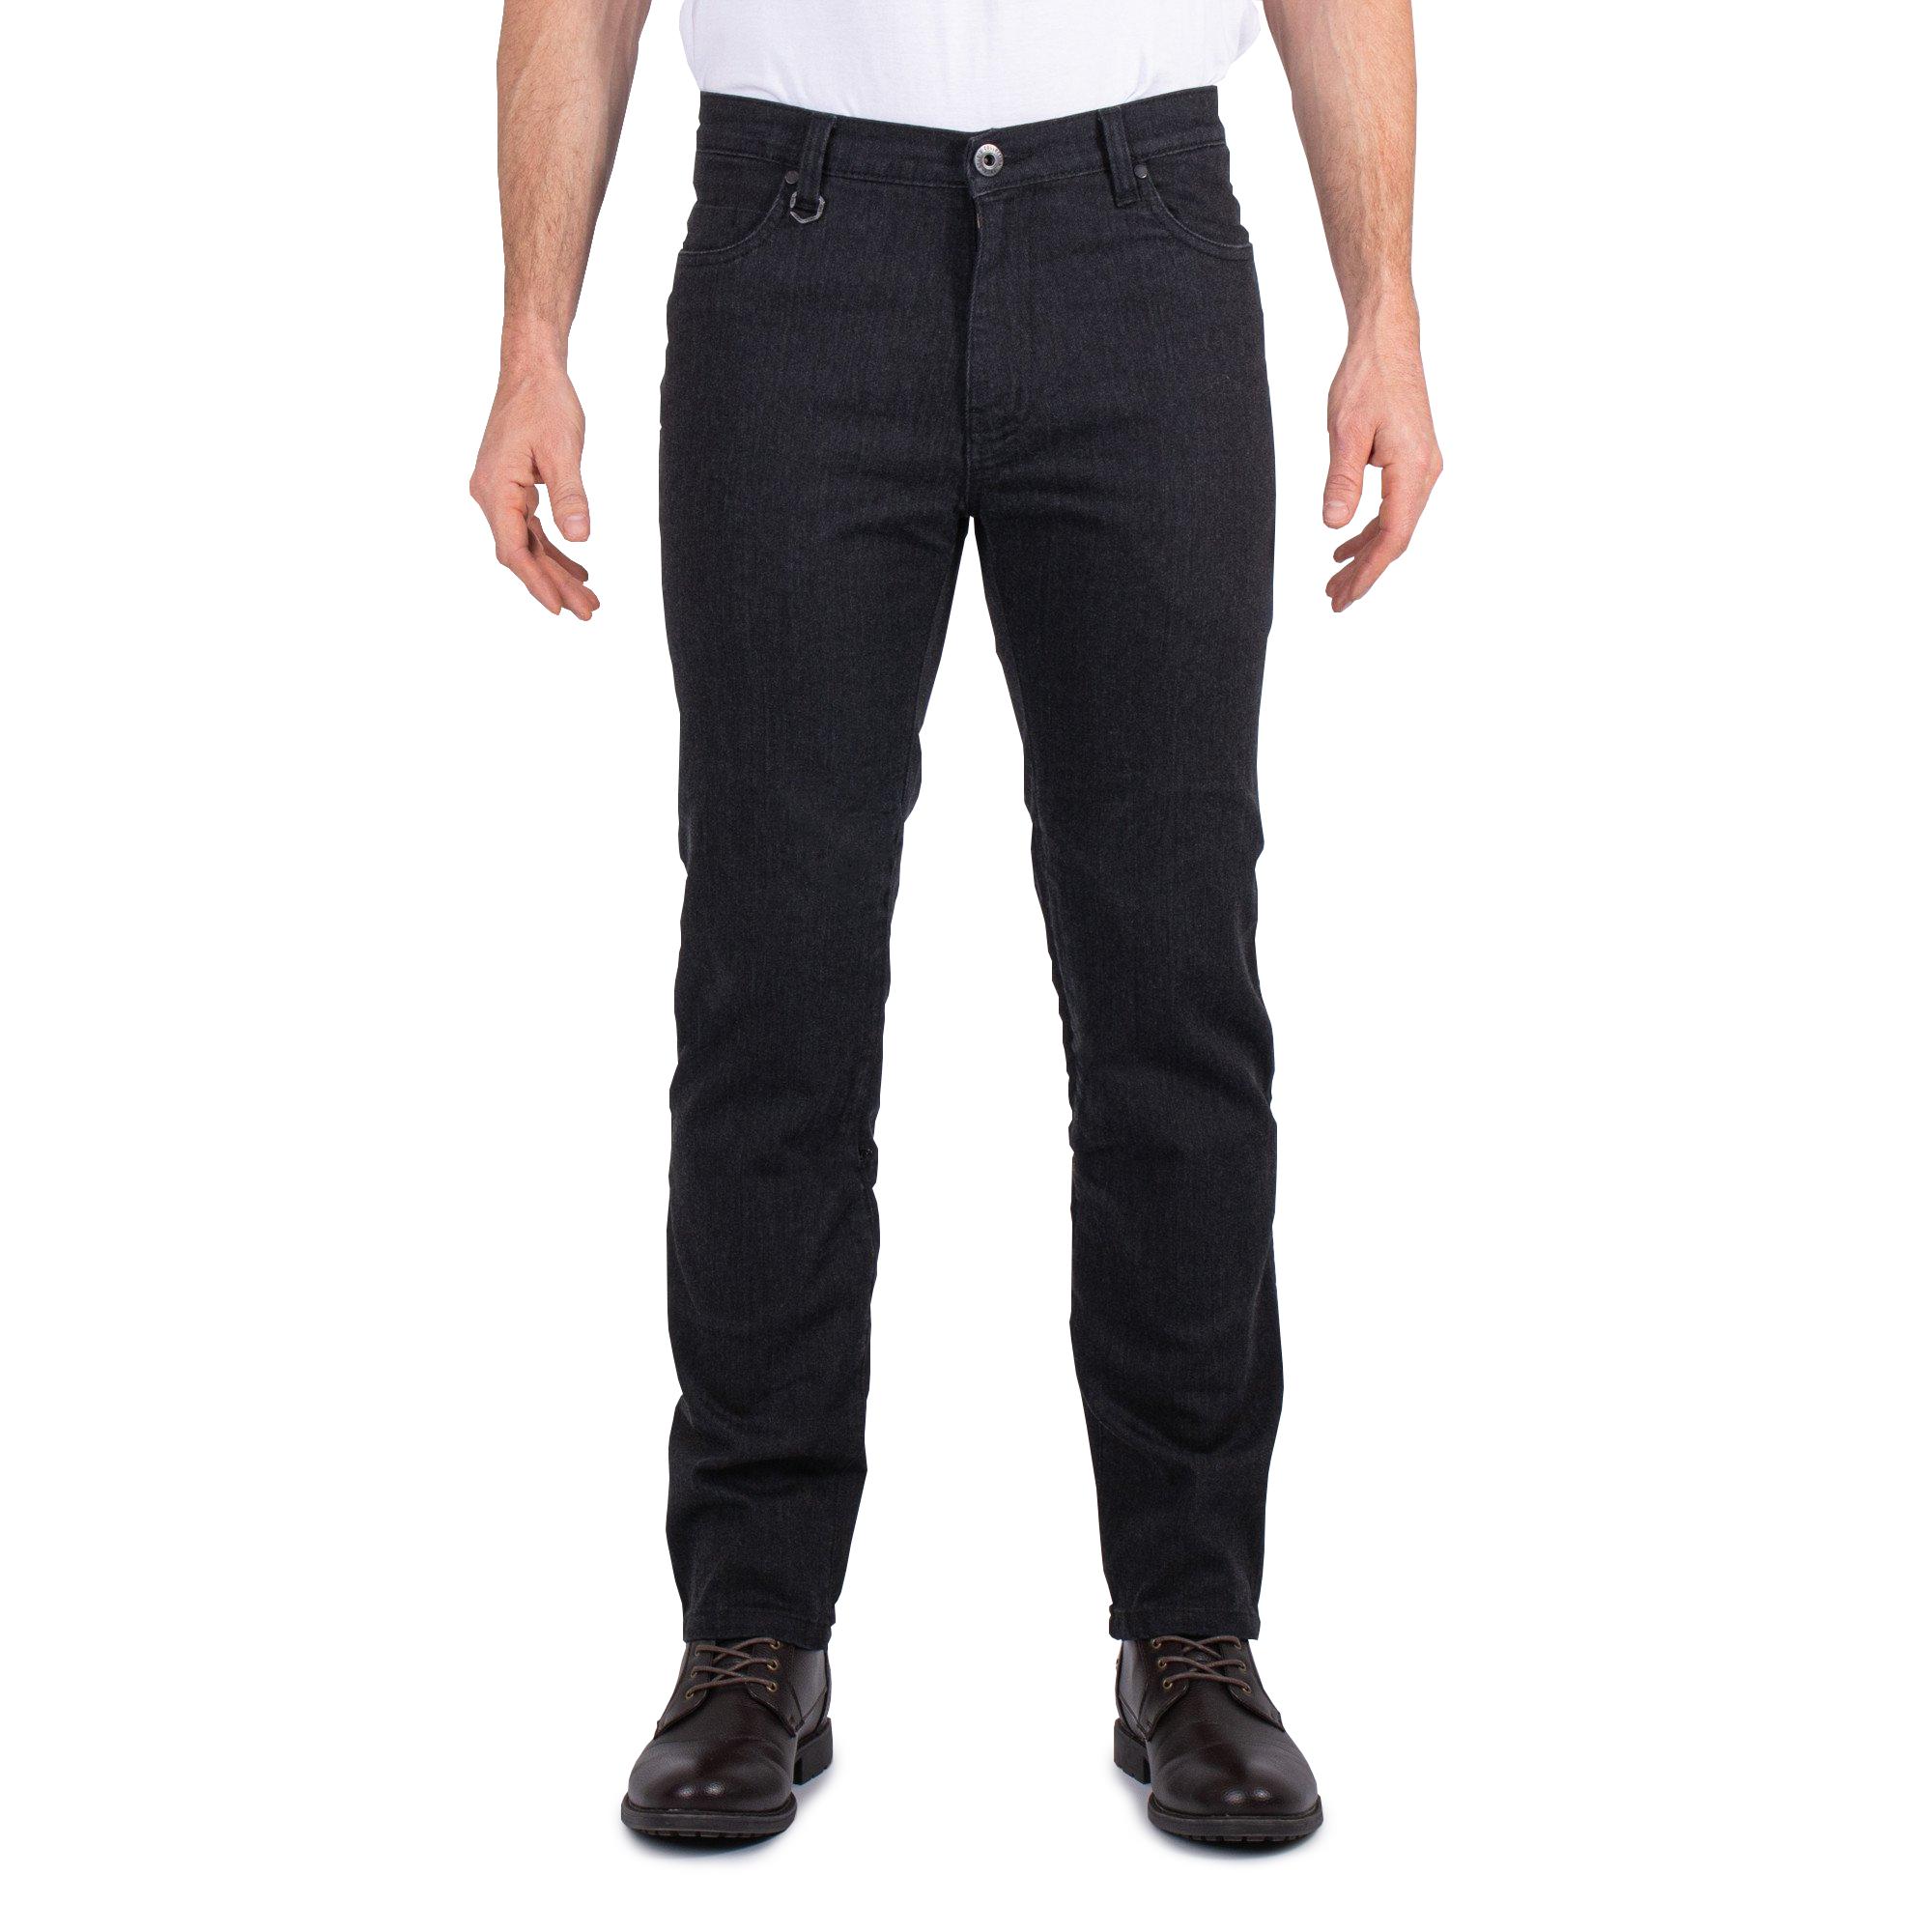 Knox Richmond Negro (Mkii) Kevlar Jeans Motorista M